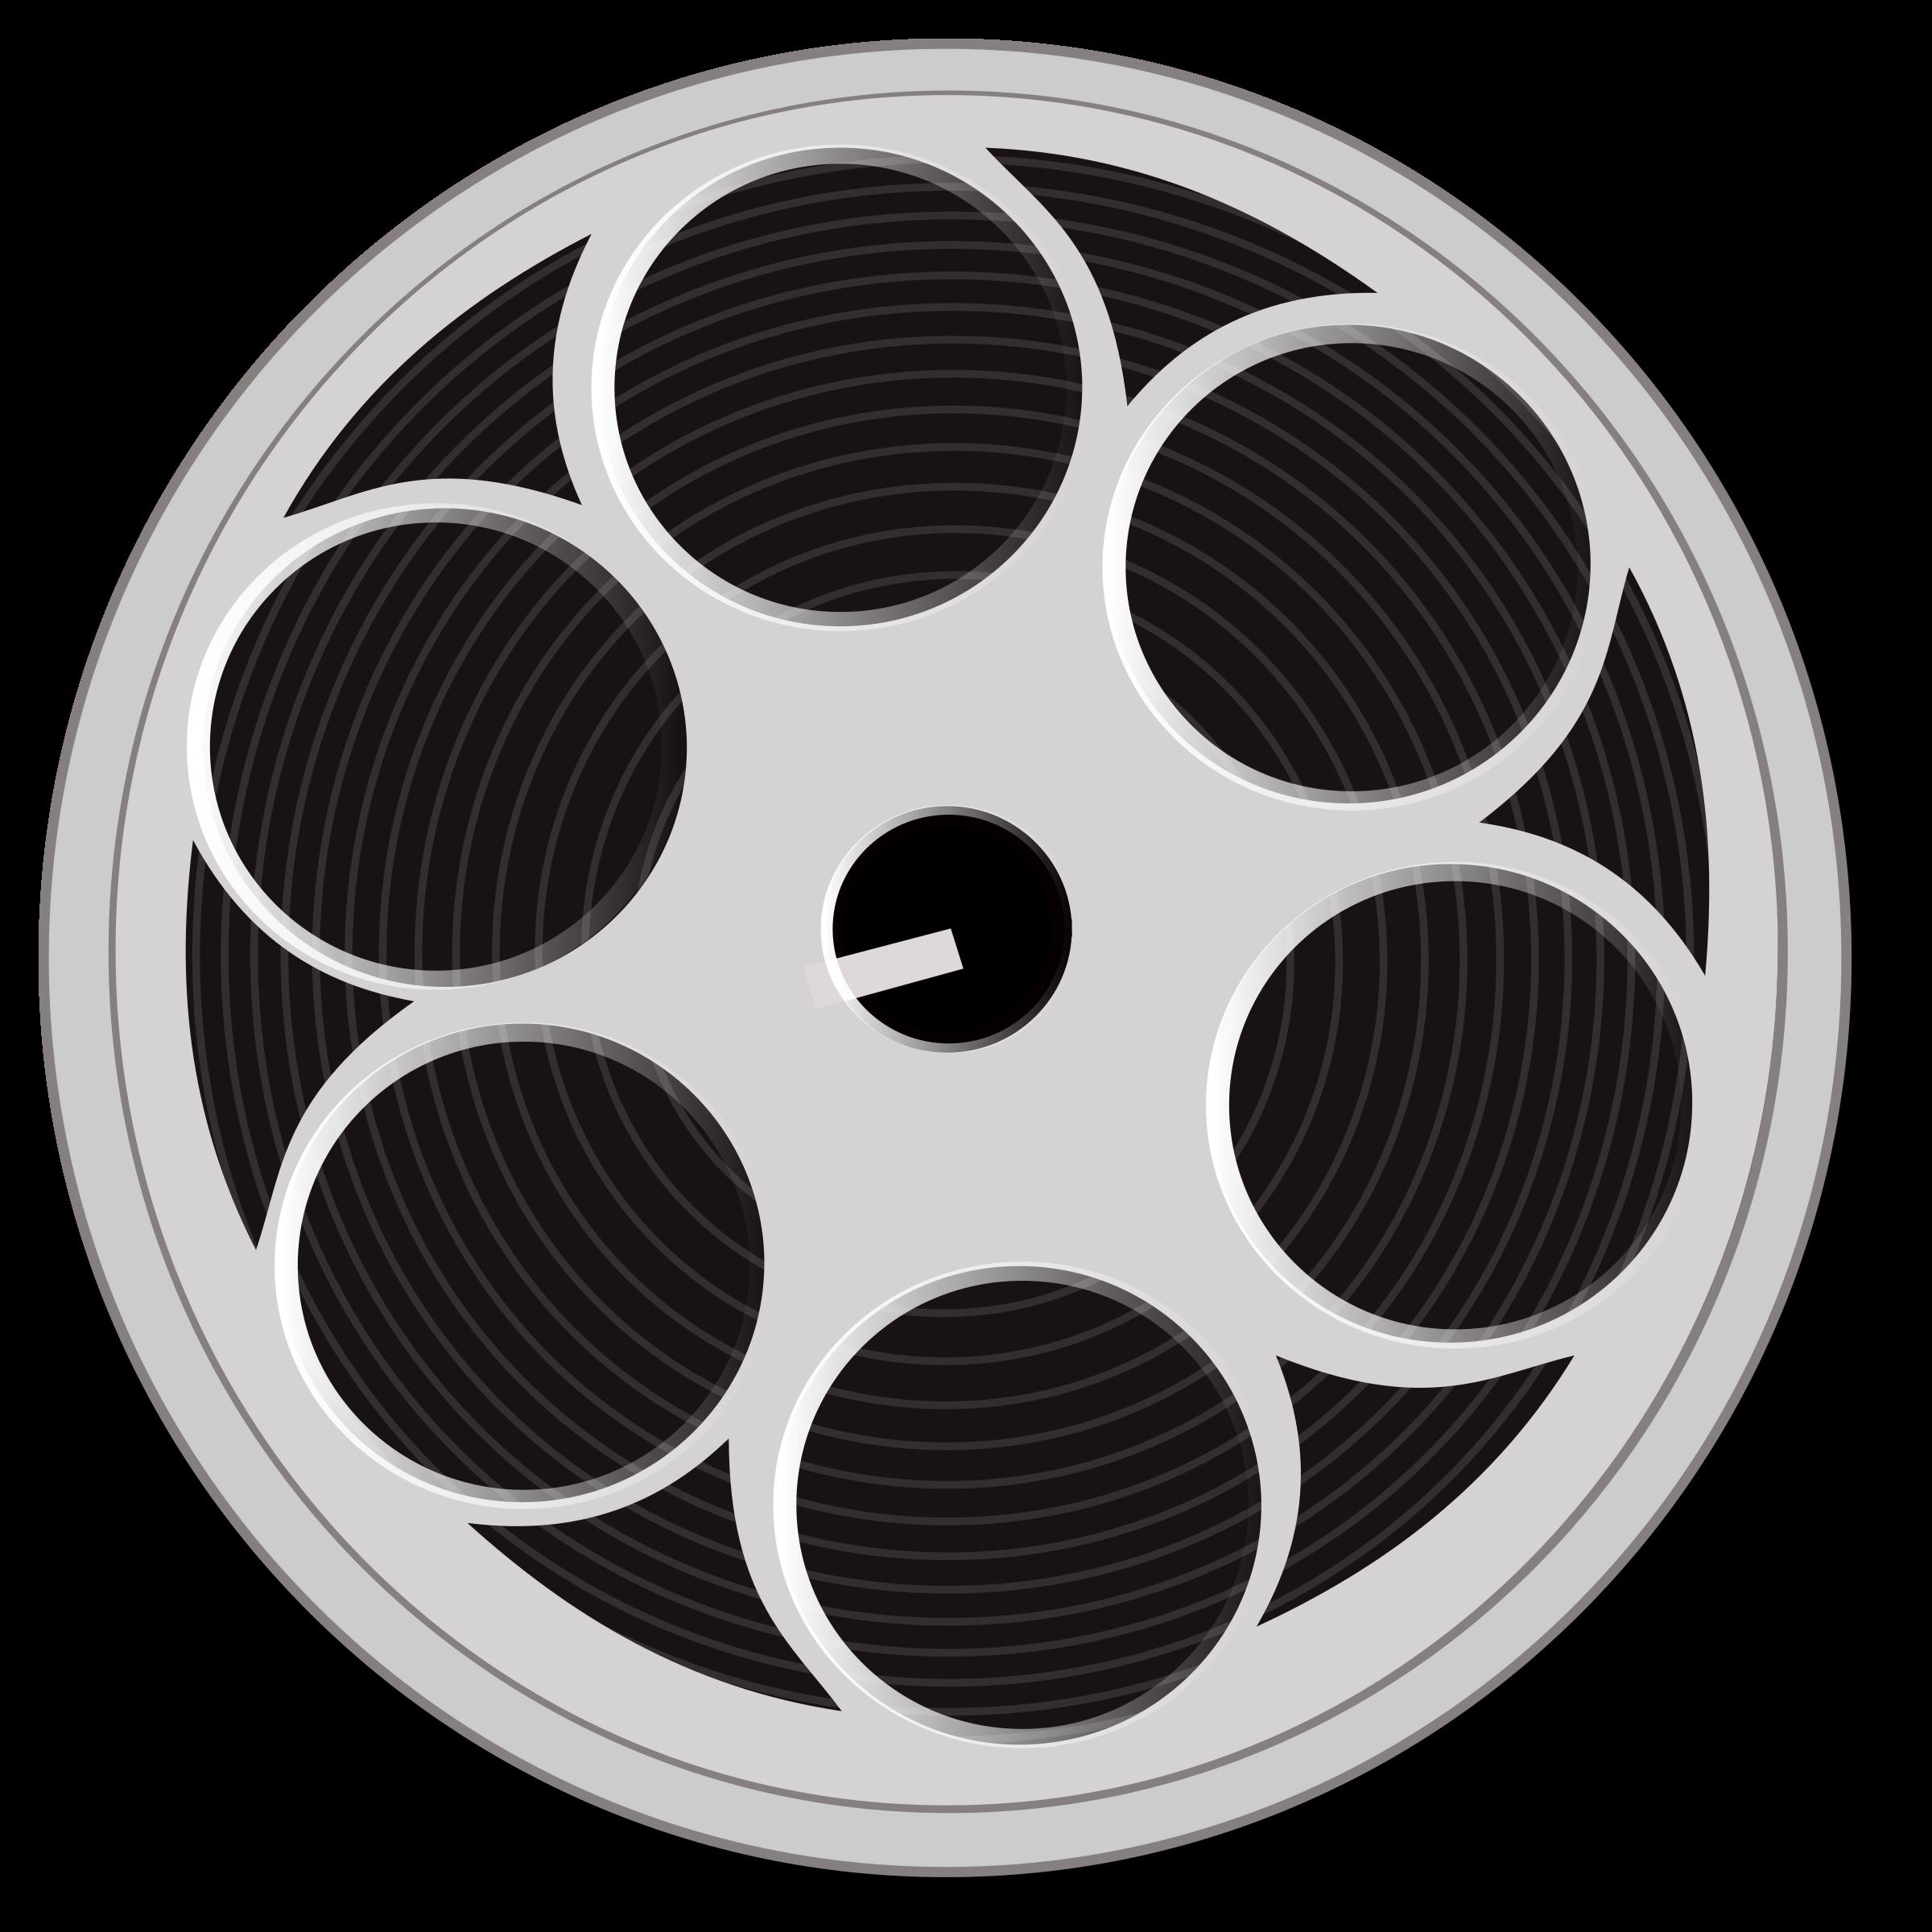 Film Reel Clipart Clip art of Film Clipart #5784 — Clipartwork.